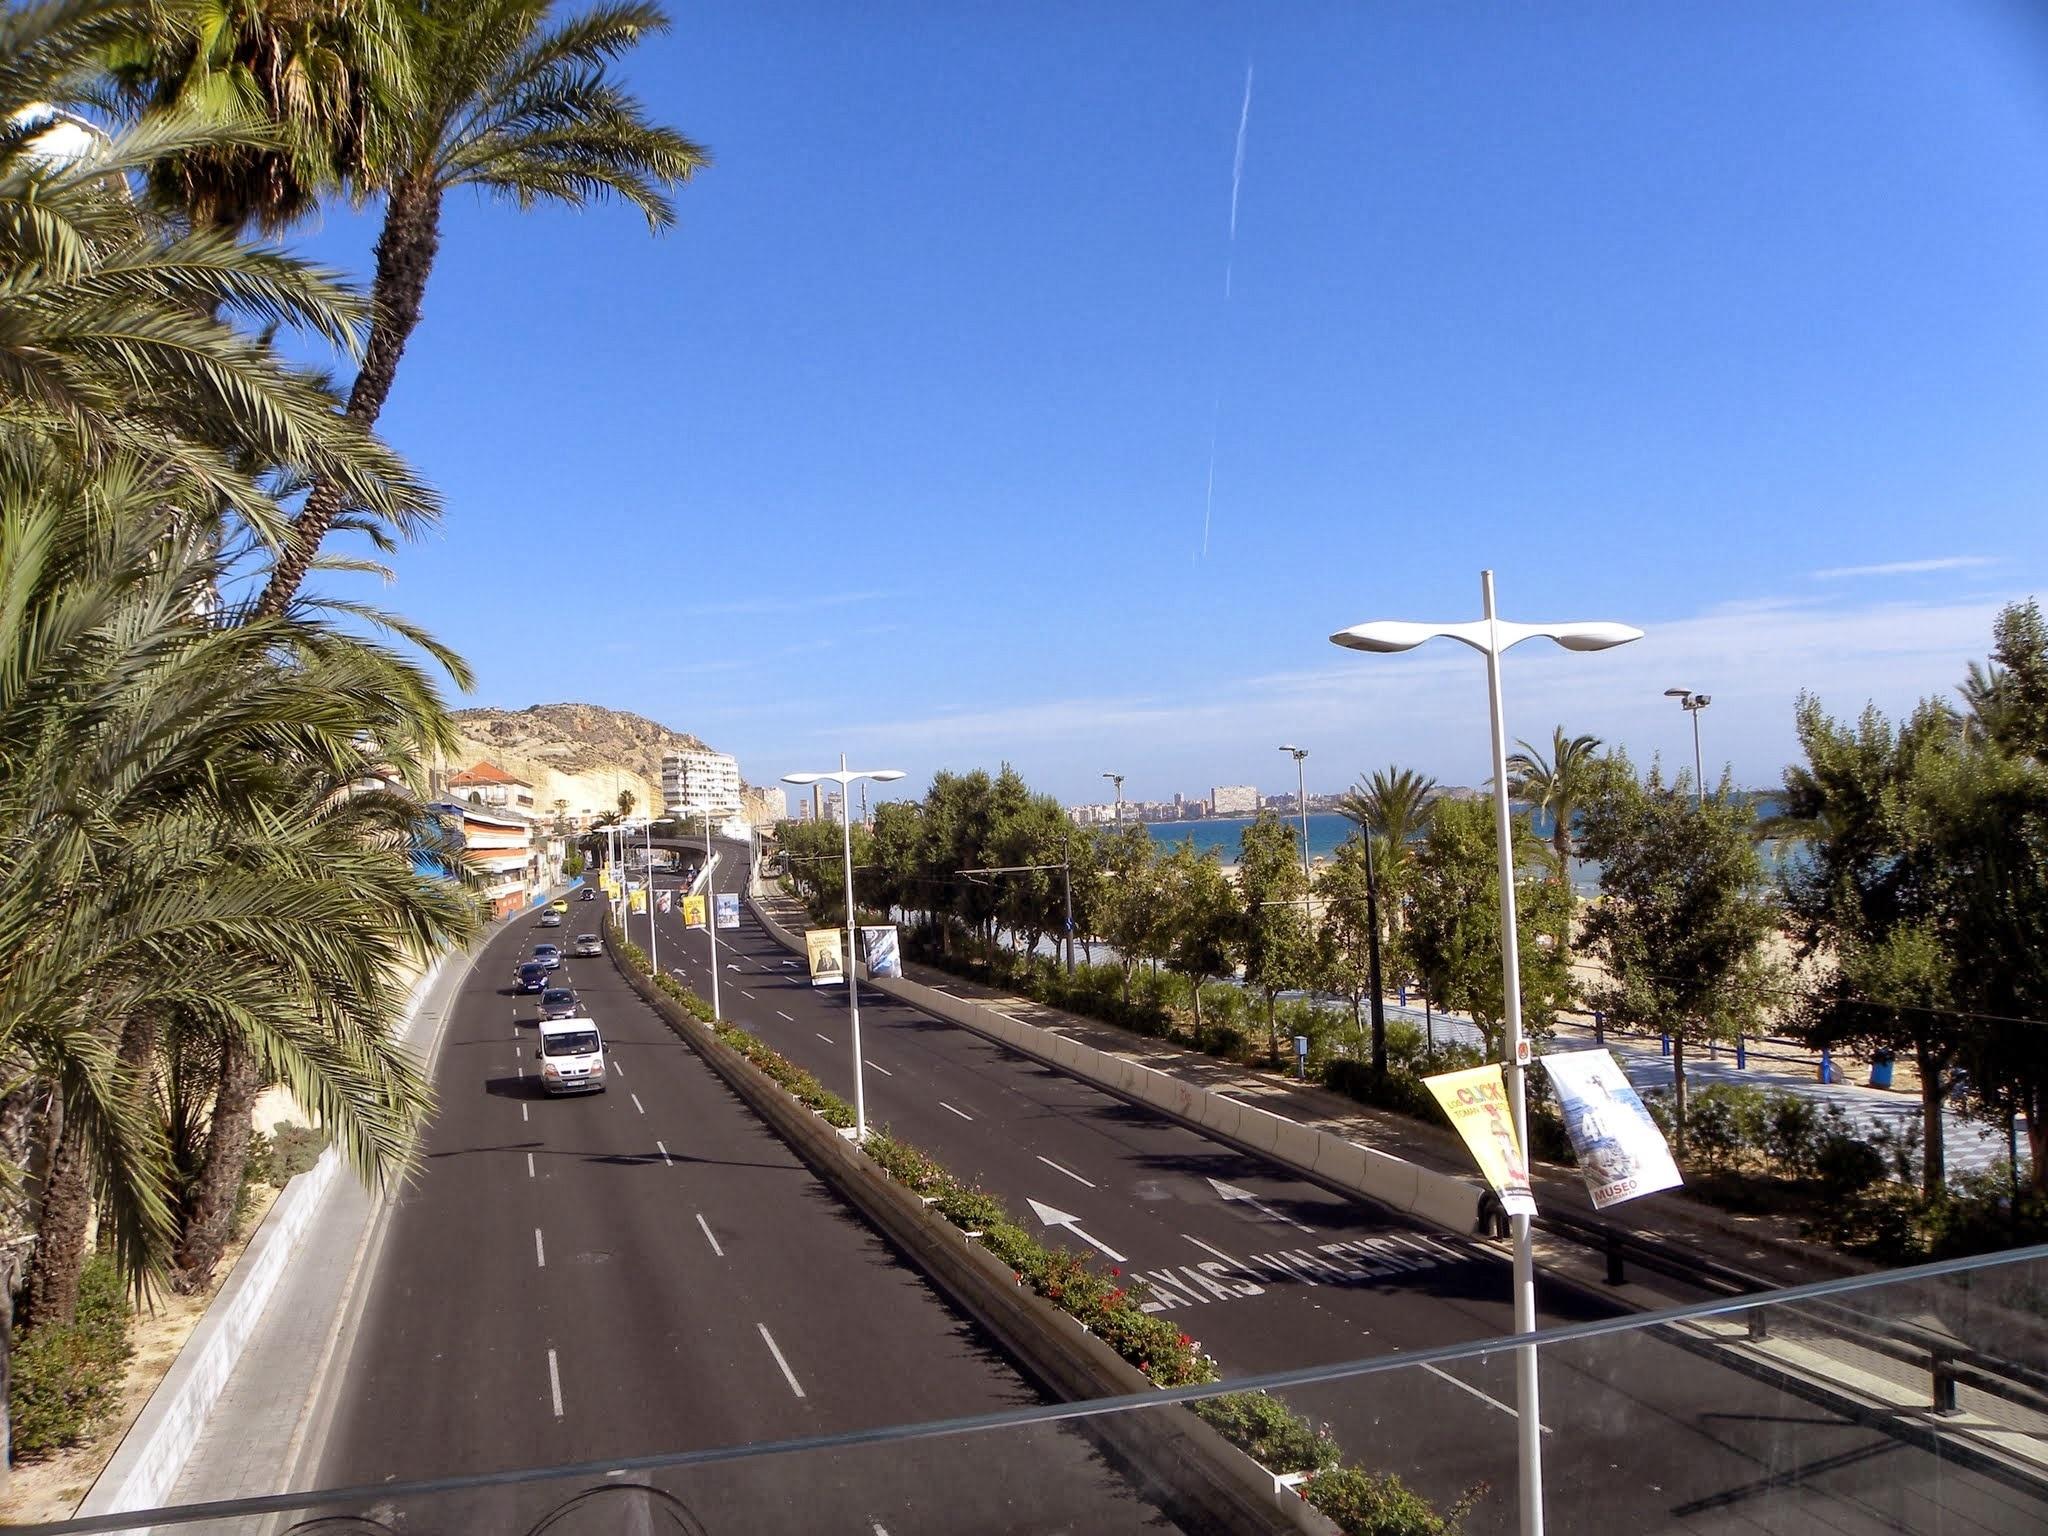 Raval Roig, Alicante, Valencian Community, Spain